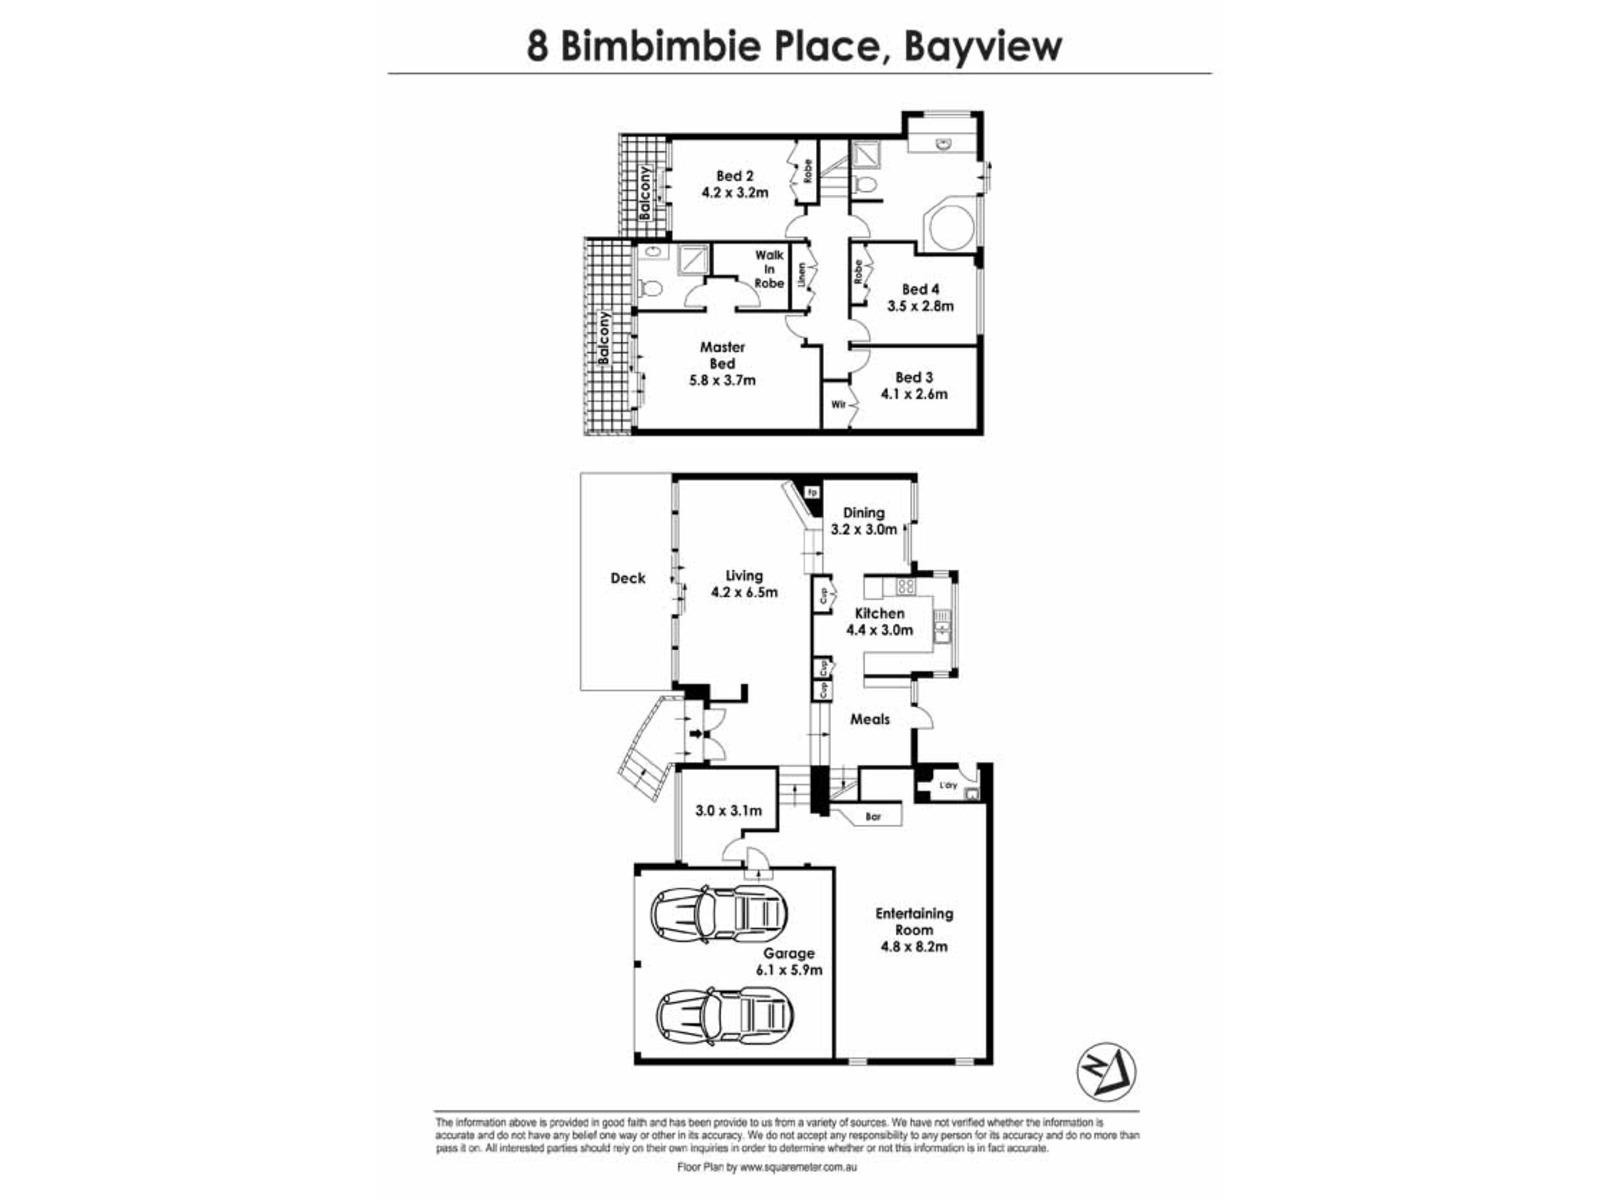 8 Bimbimbie Place, Bayview